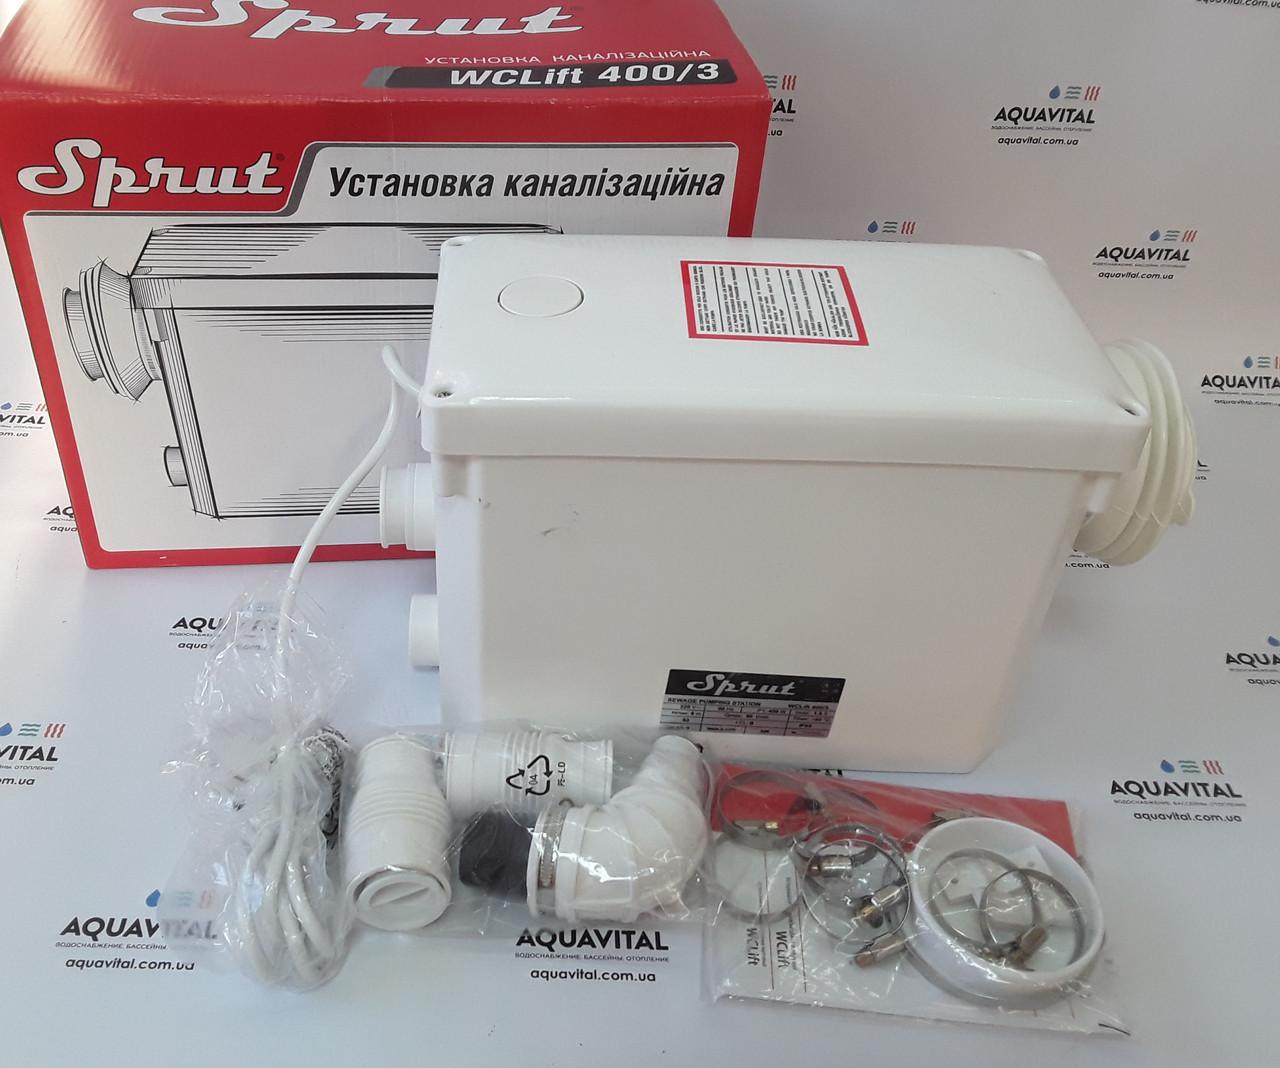 Бытовая канализационная установка Sprut WCLIFT 400/3